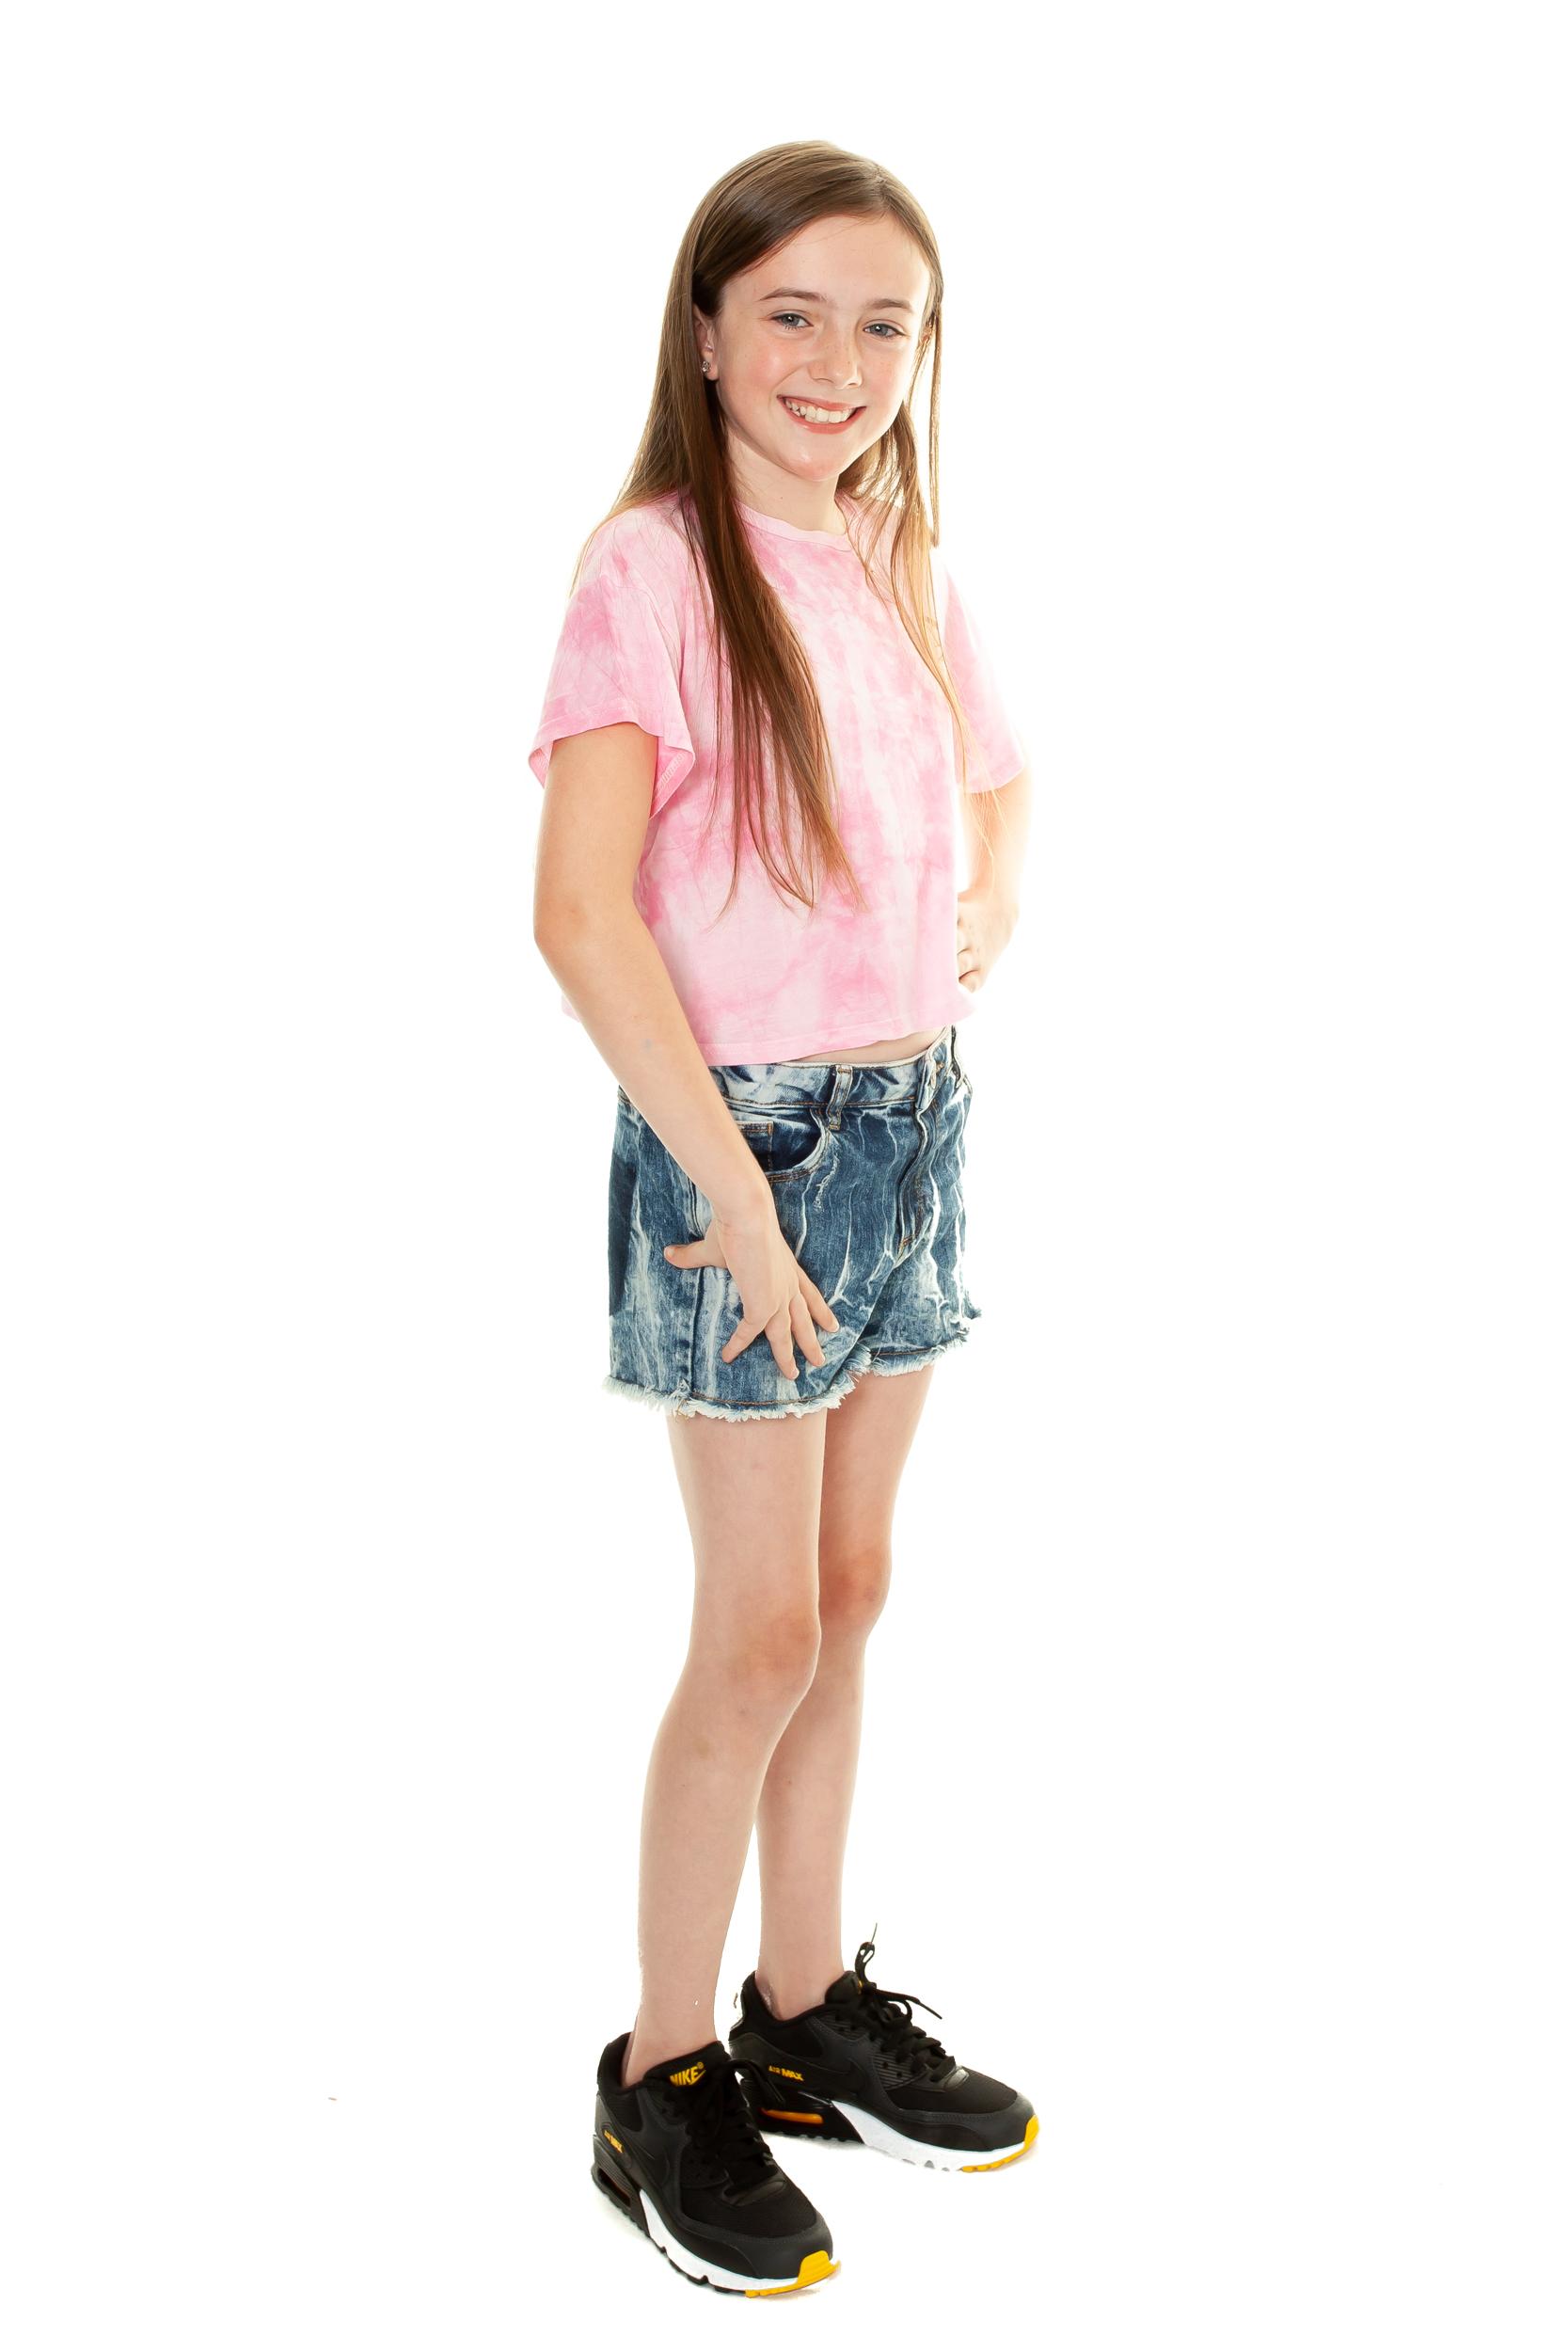 Mia Chandler 02.12.09 (4).jpg